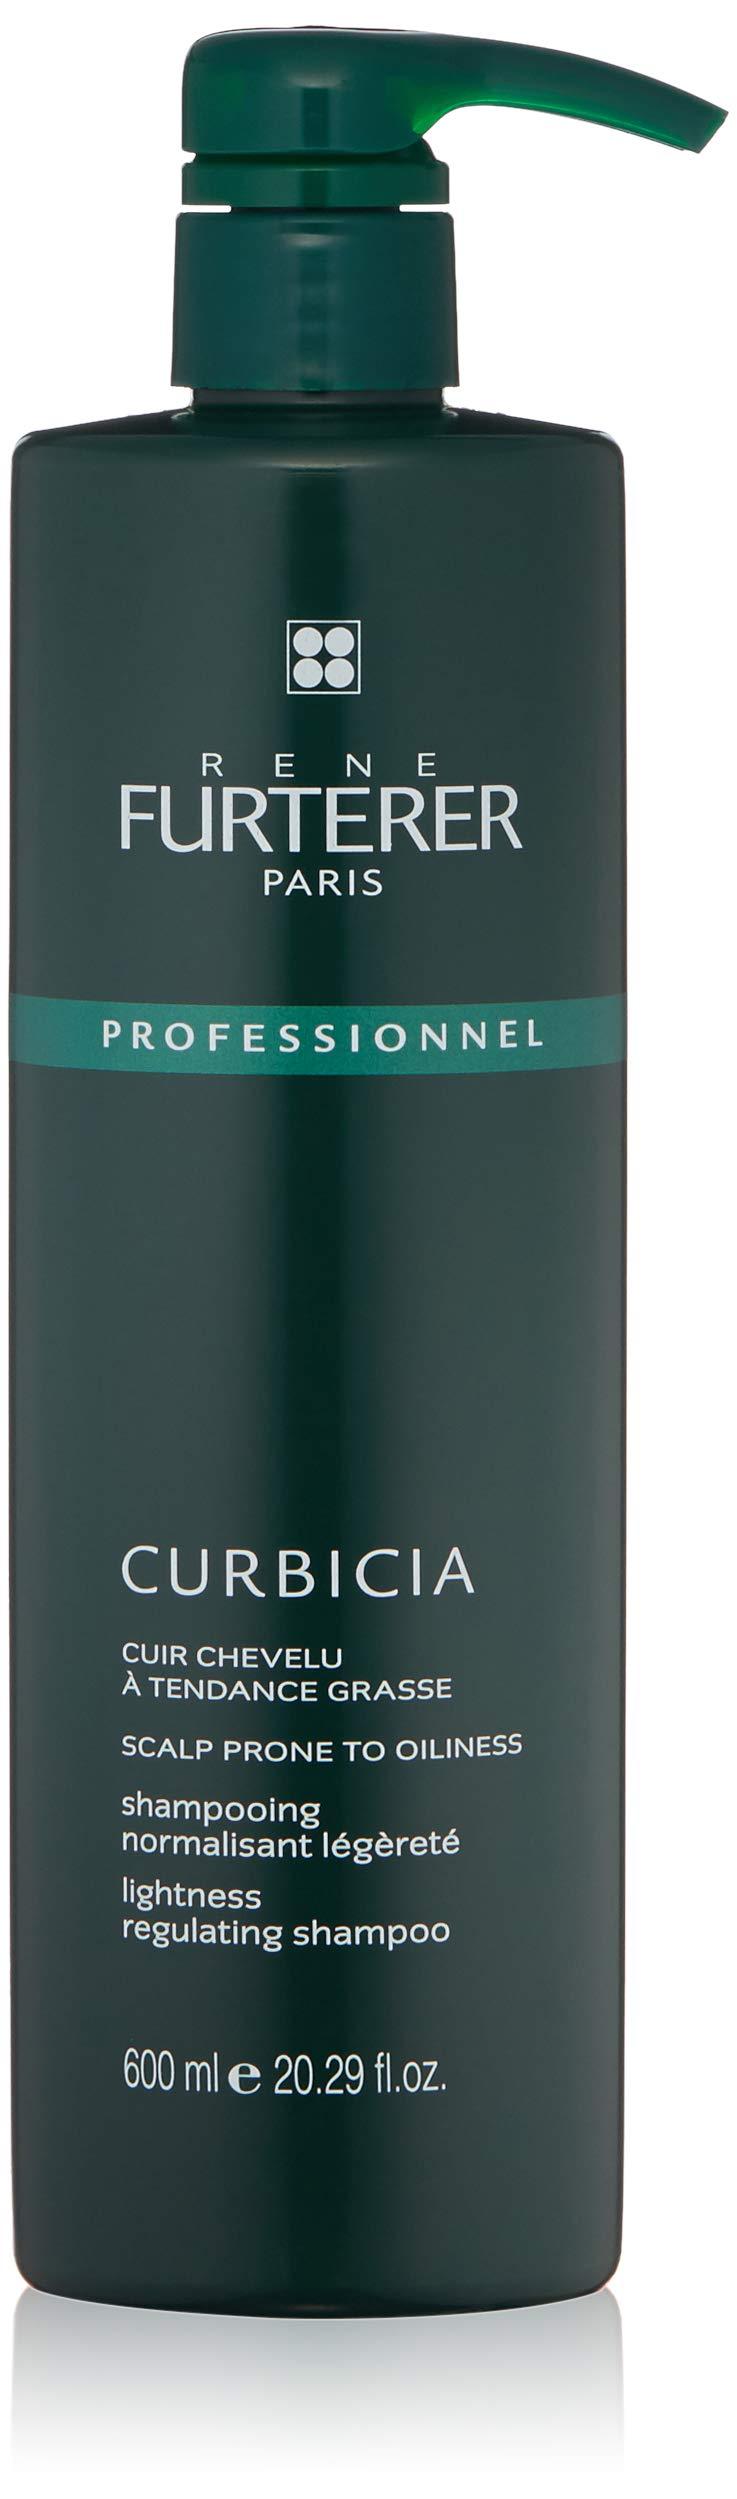 Rene Furterer CURBICIA Normalizing Lightness Shampoo, Oily-Prone  Scalp, Sebum Control, Pump, 20.2 oz. by Rene Furterer